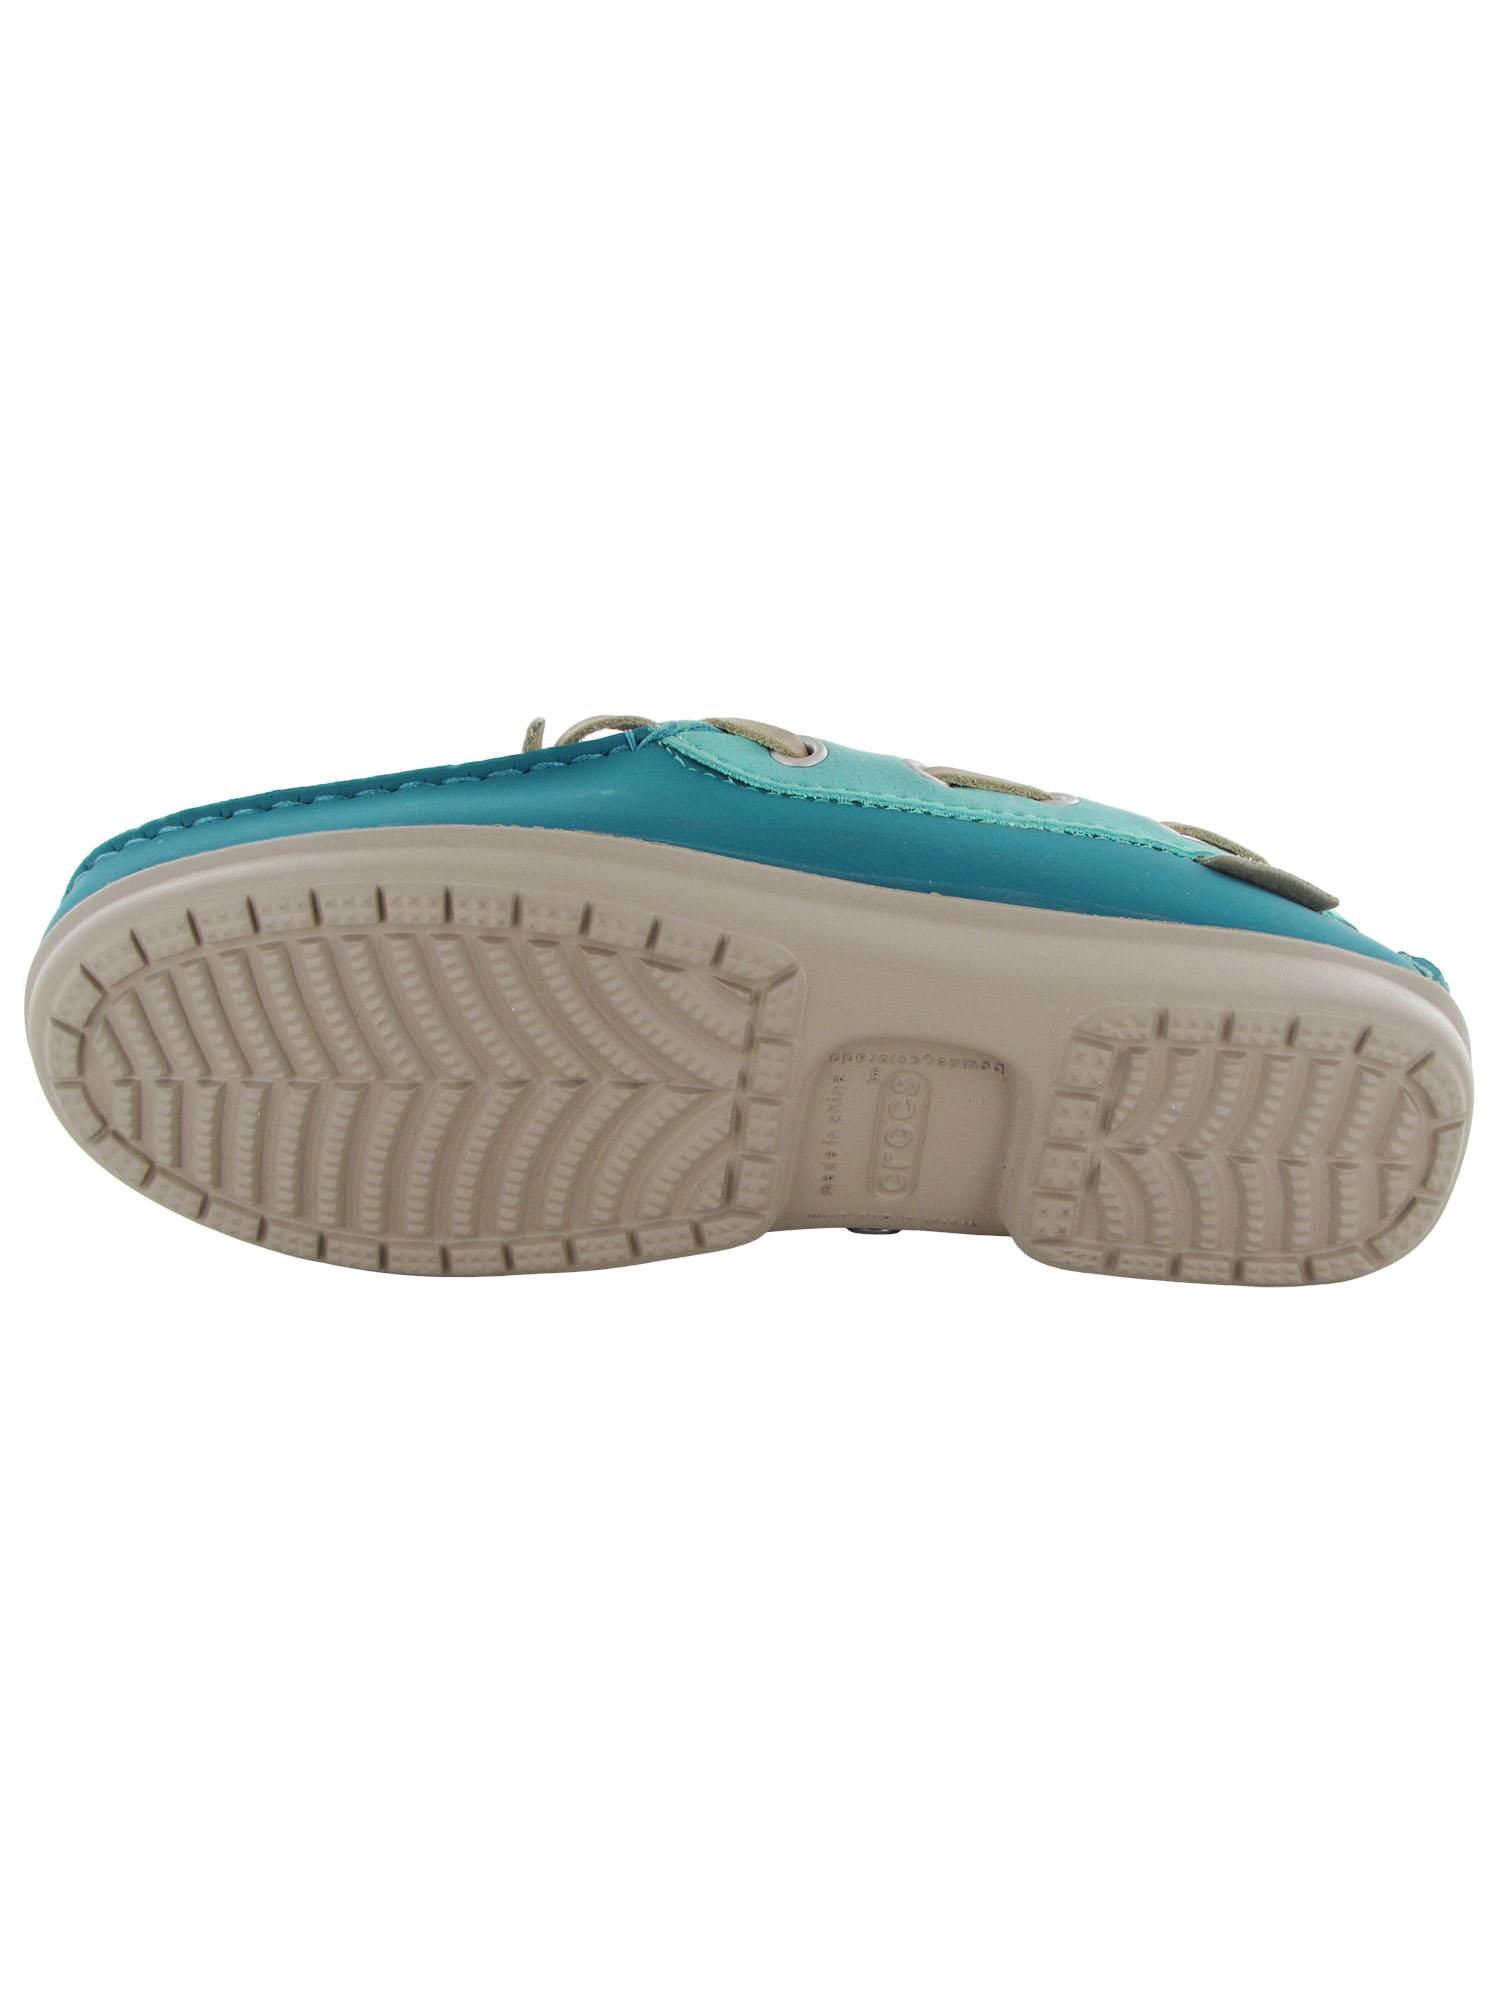 Crocs-Womens-Wrap-ColorLite-Loafer-Shoes thumbnail 6